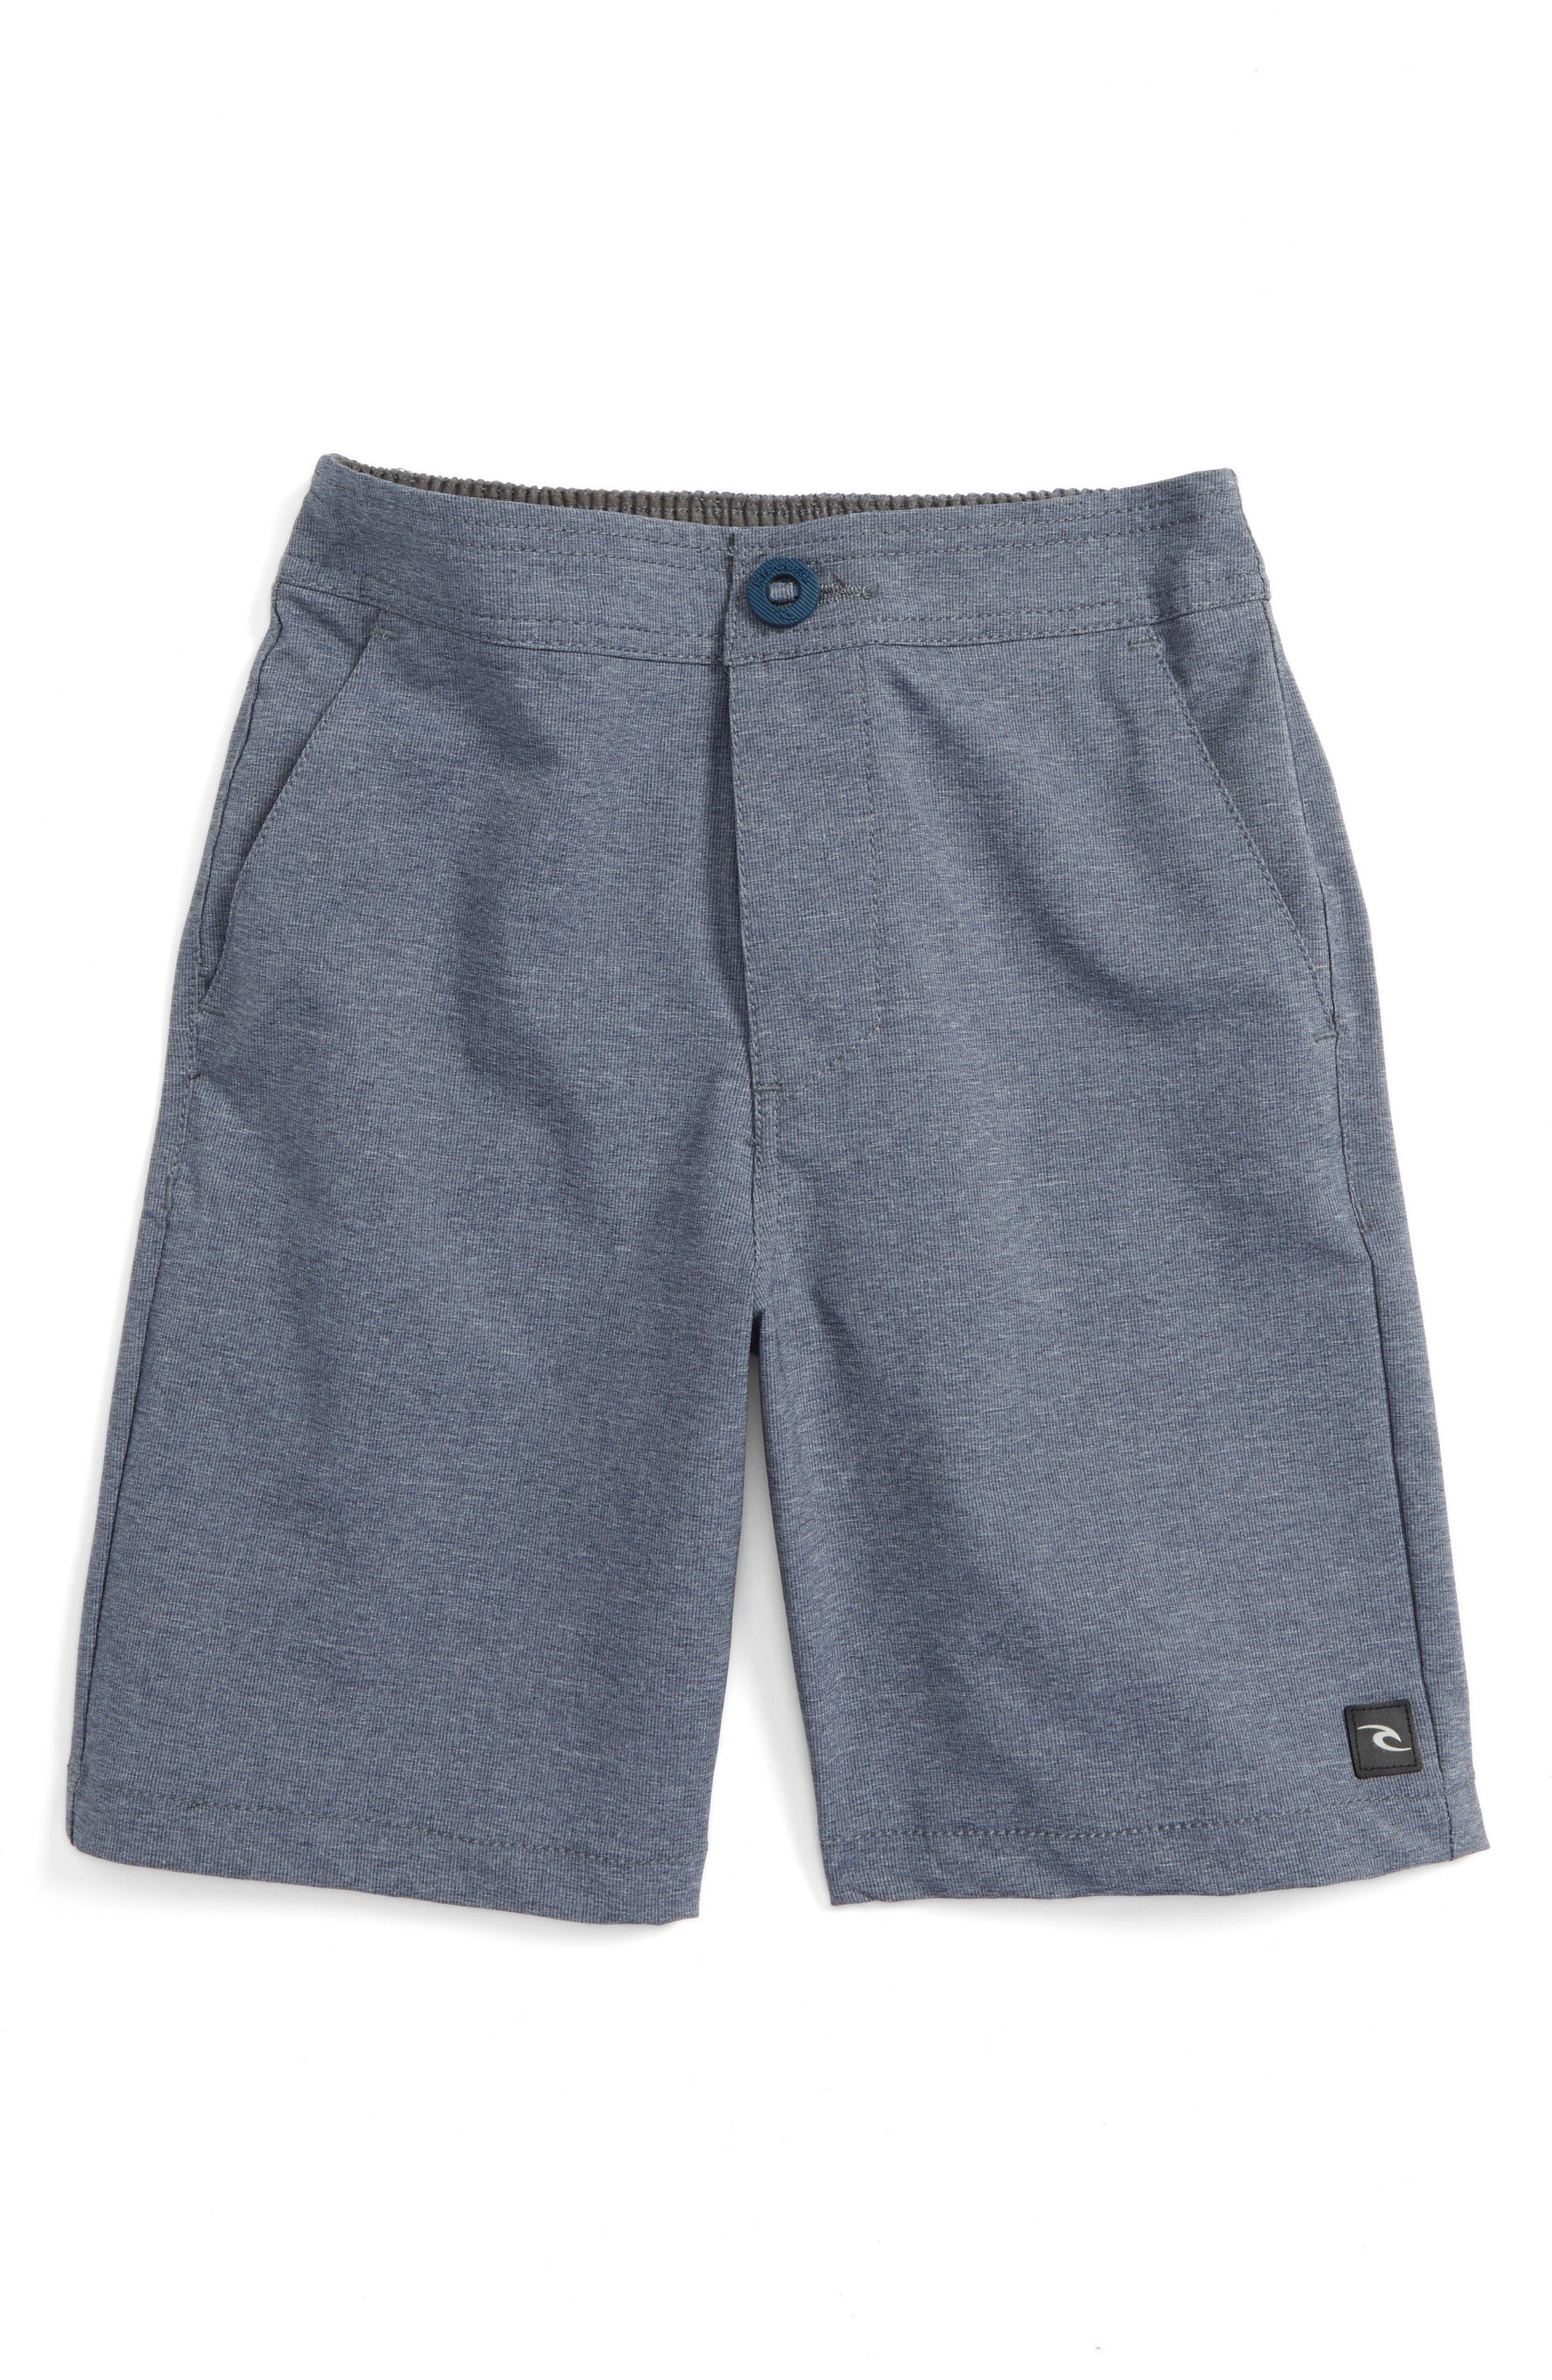 Alternate Image 1 Selected - Rip Curl Omaha Hybrid Board Shorts (Toddler Boys & Little Boys)